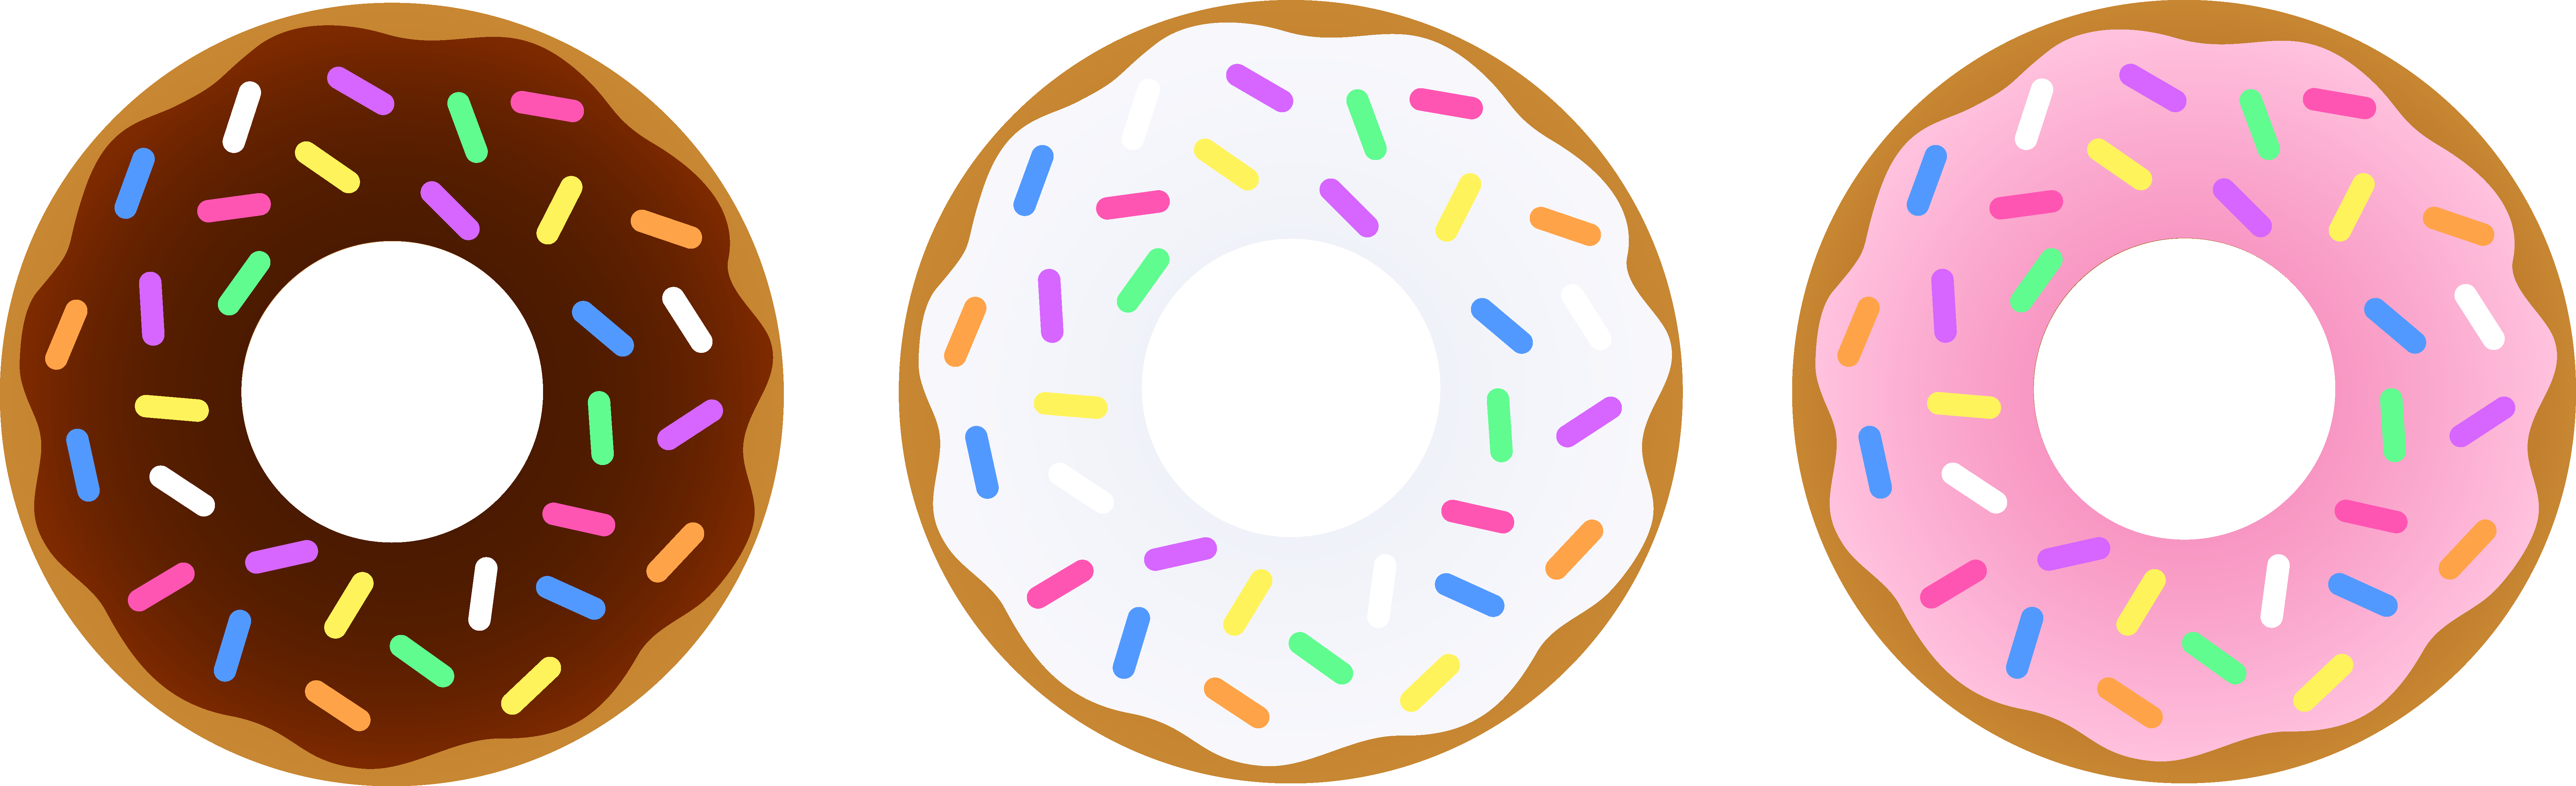 Clipart Donut-clipart donut-1